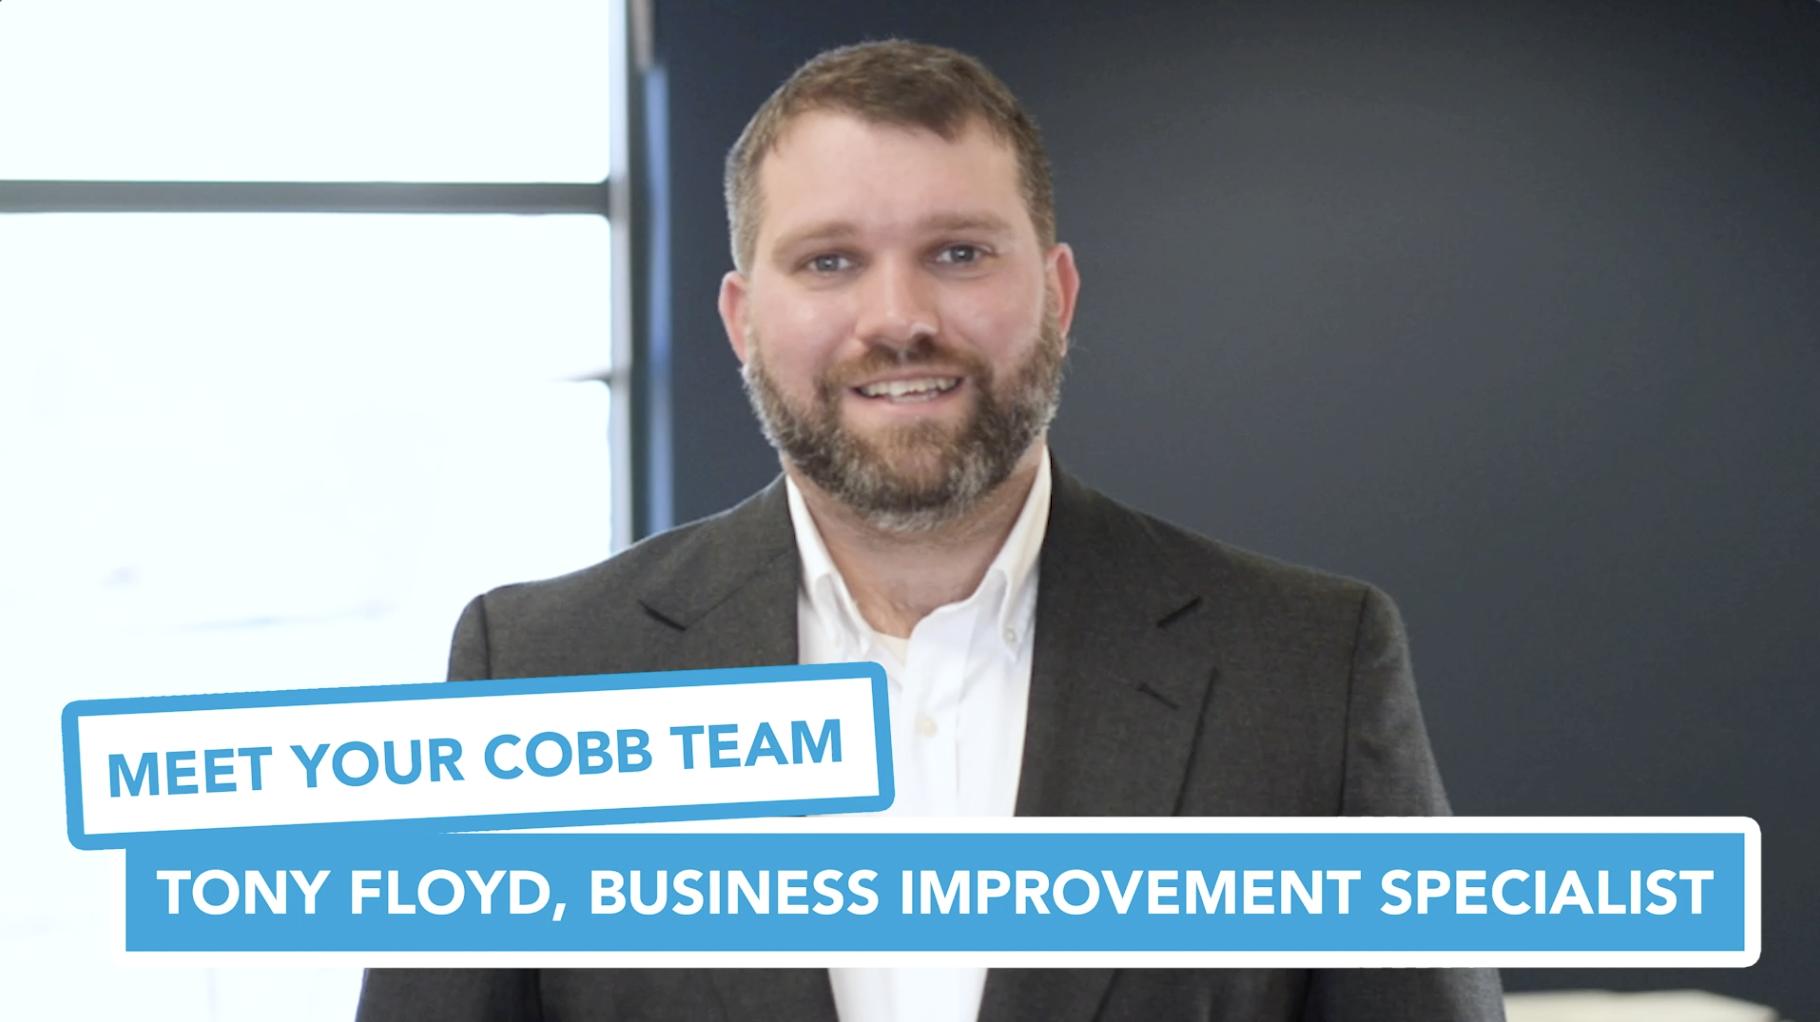 Meet Your Cobb Team: Tony Floyd, Business Improvement Specialist